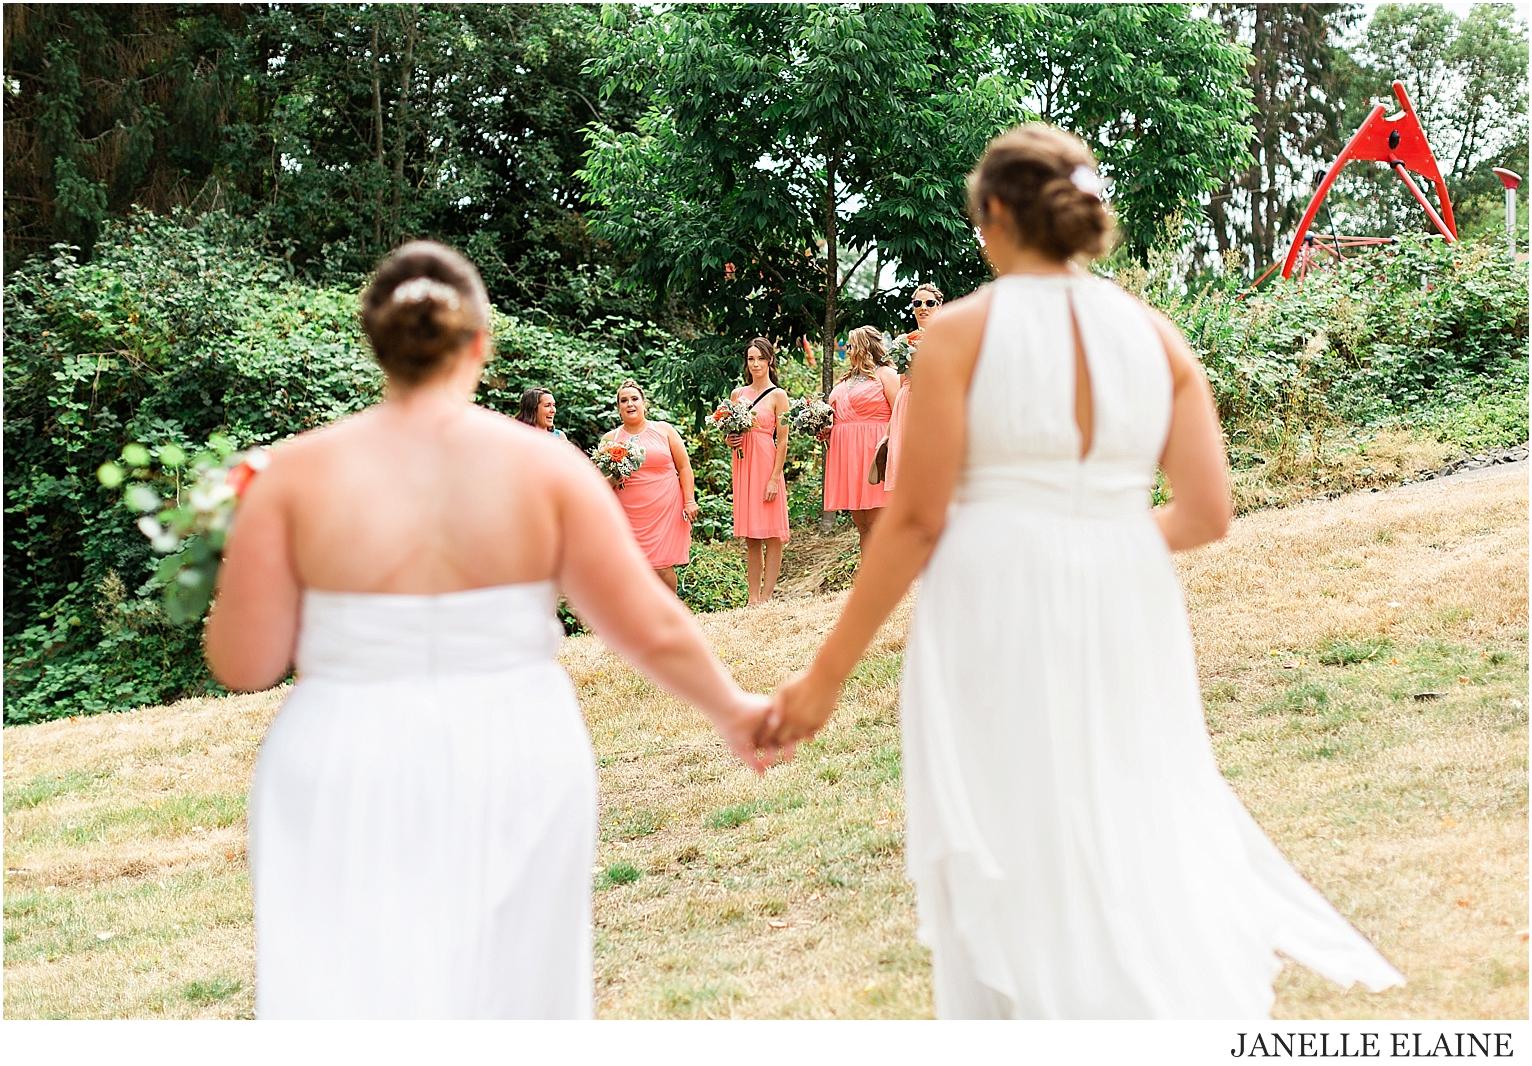 liz and christina lanning-wedding party-luther burbank park-janelle elaine photography-2.jpg